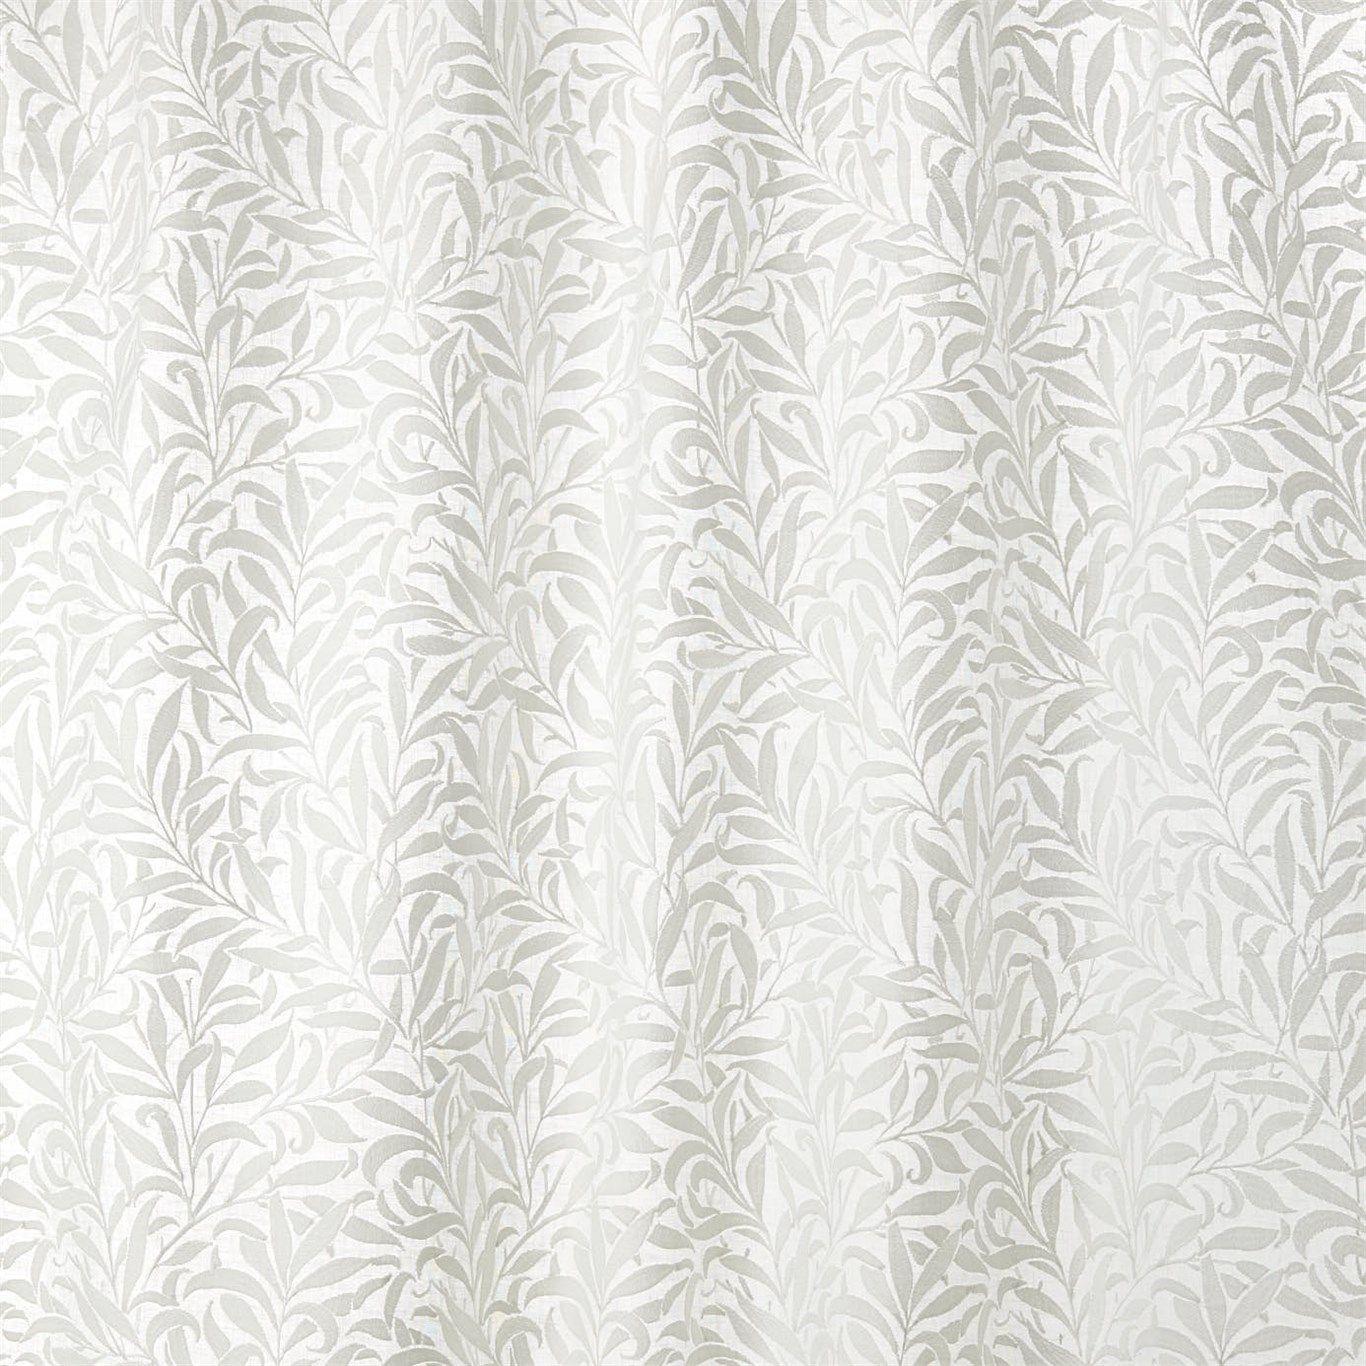 https://www.william-morris.co.uk/shop/fabric/pure-fabrics/pure ...